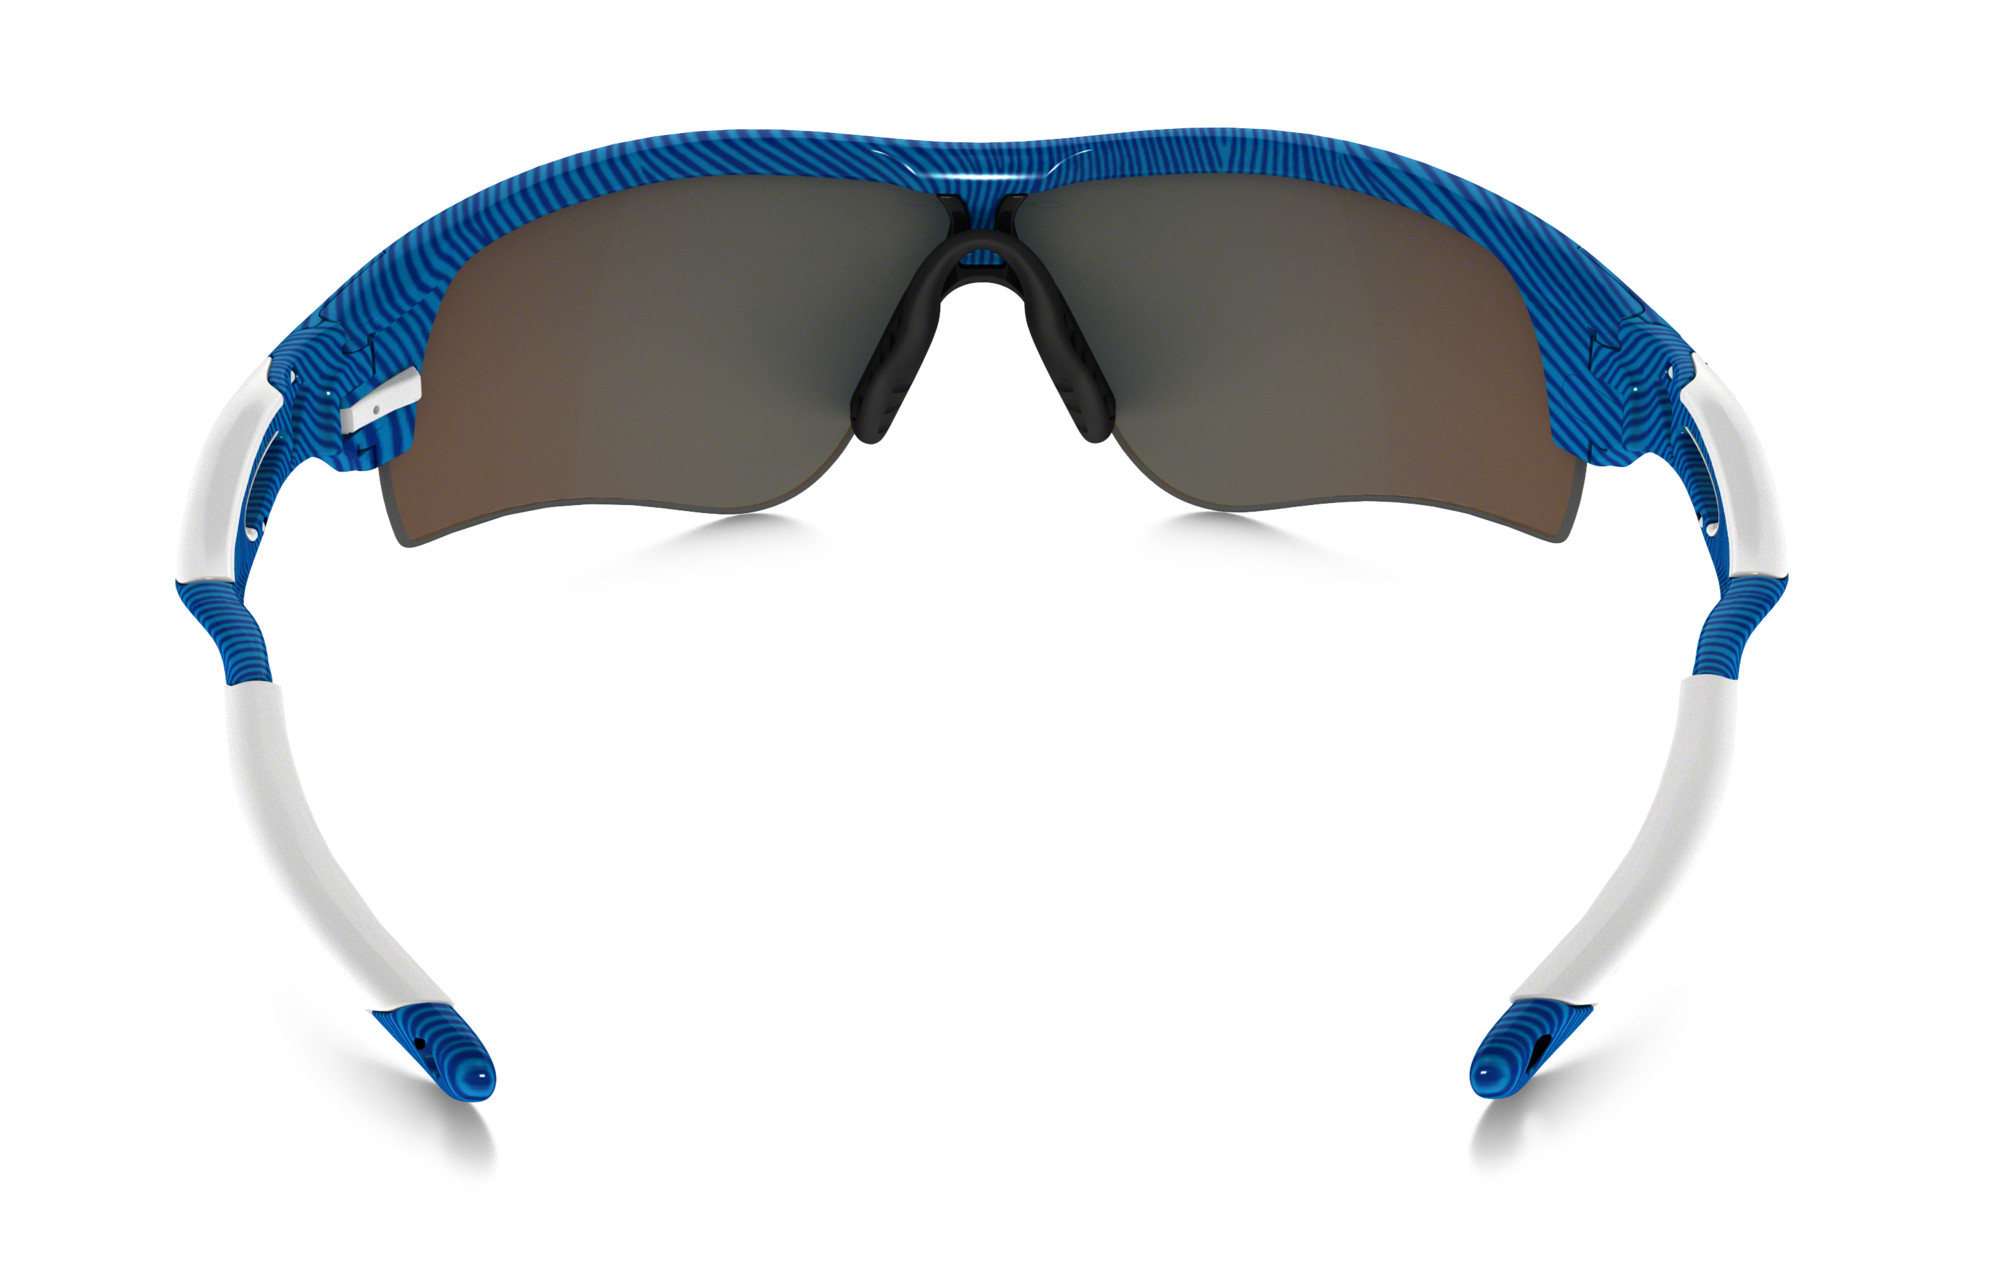 855e70c7e04396 OAKLEY Paire de lunettes FINGERPRINT RADARLOCK PATH Bleu Sapphire Iridium  réf oo9181-46